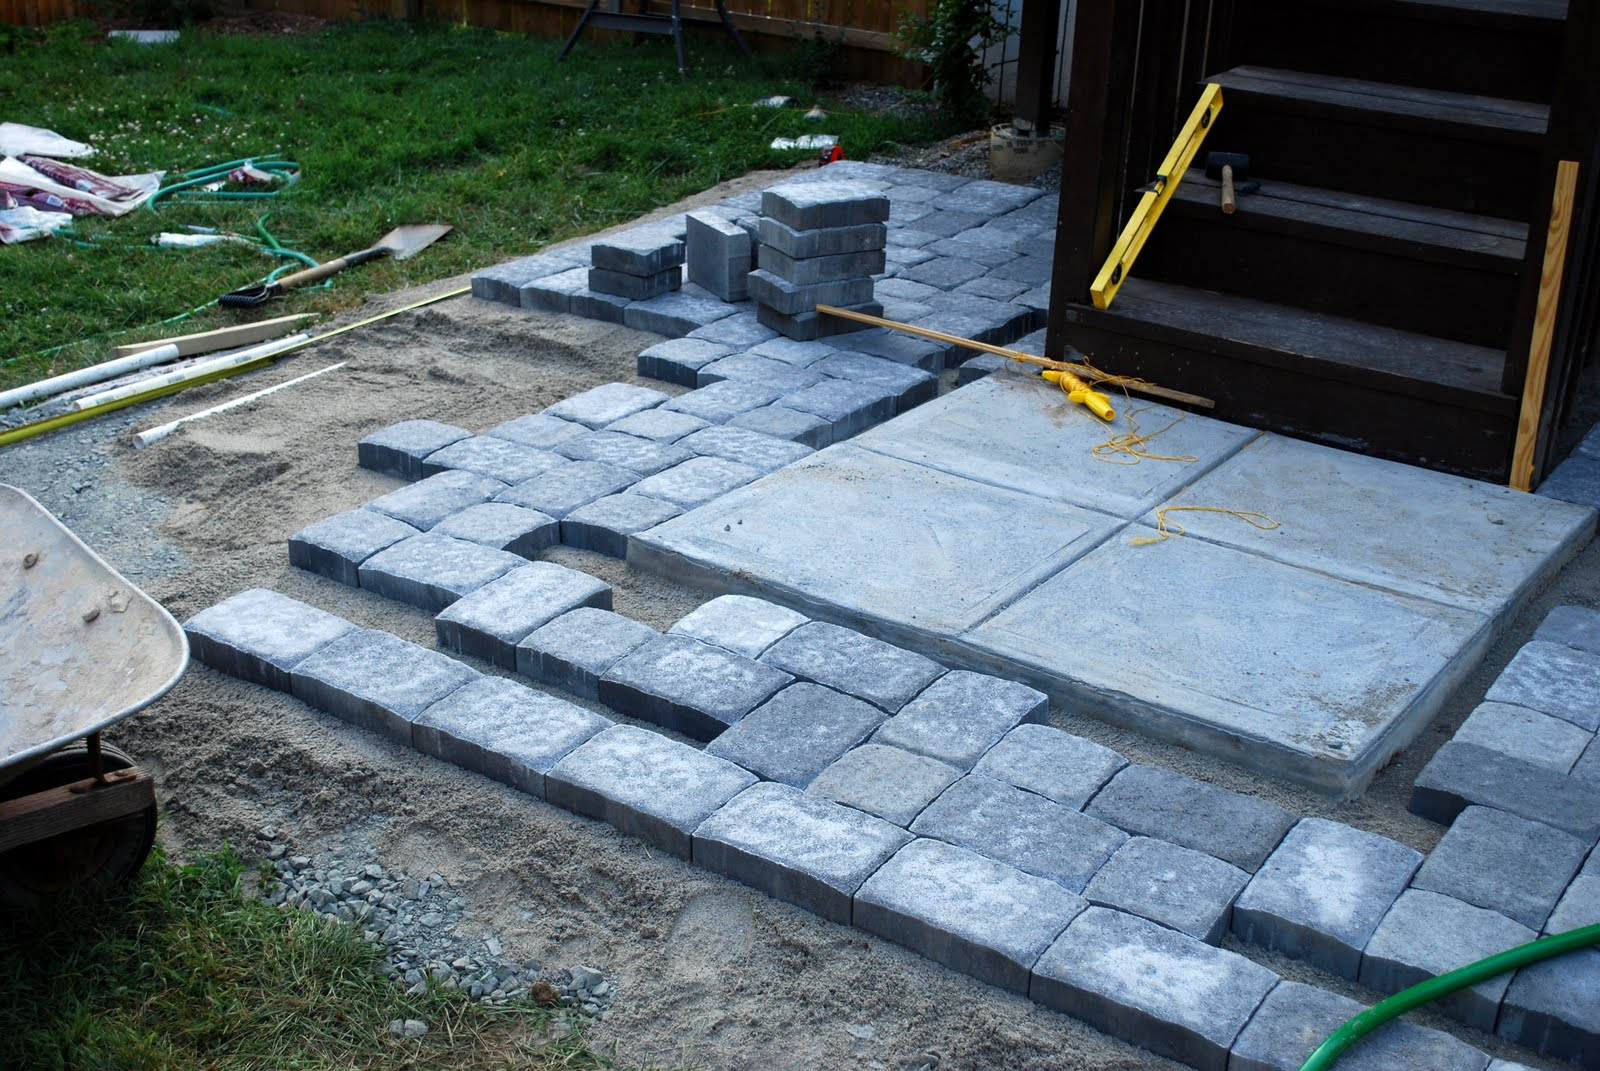 Building A Paver Patio | Patio Design Ideas